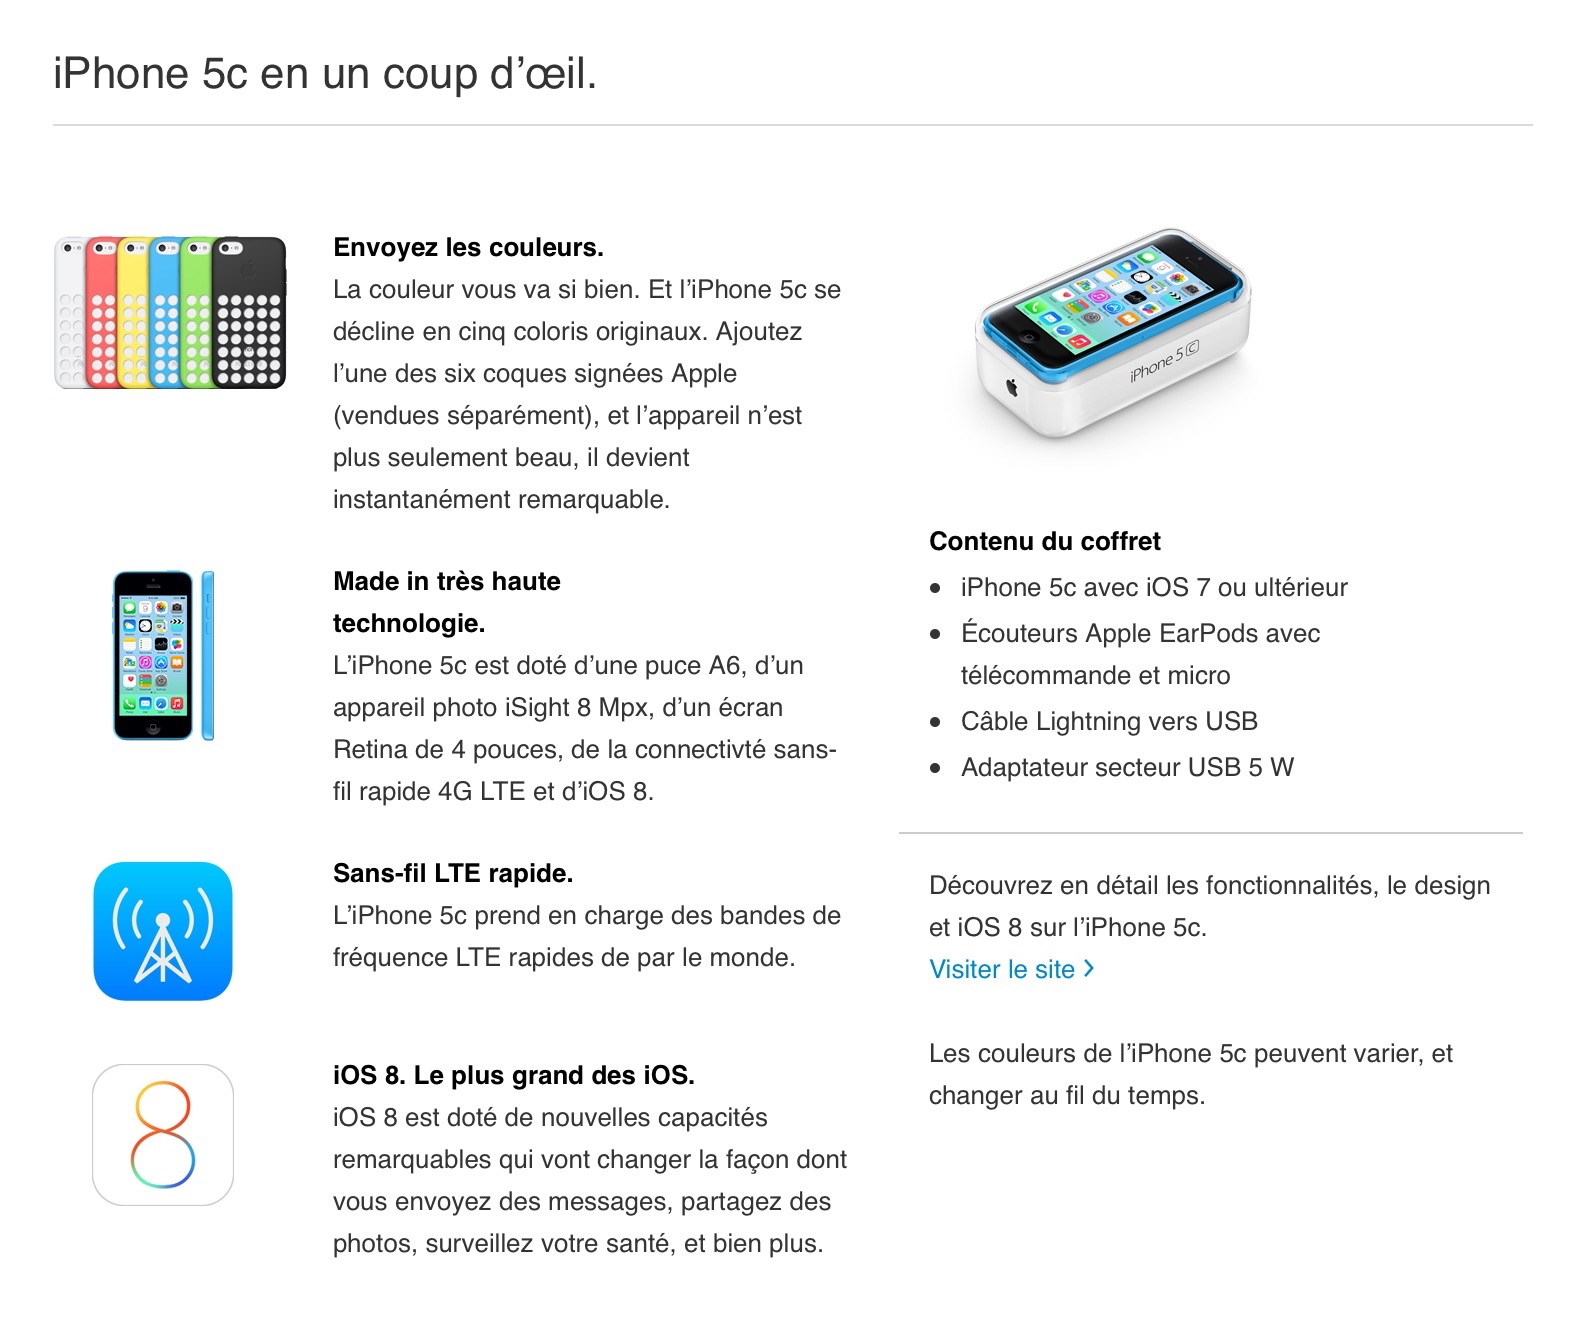 Apple iPhone 5C 8GO - TelOneiPhone.fr